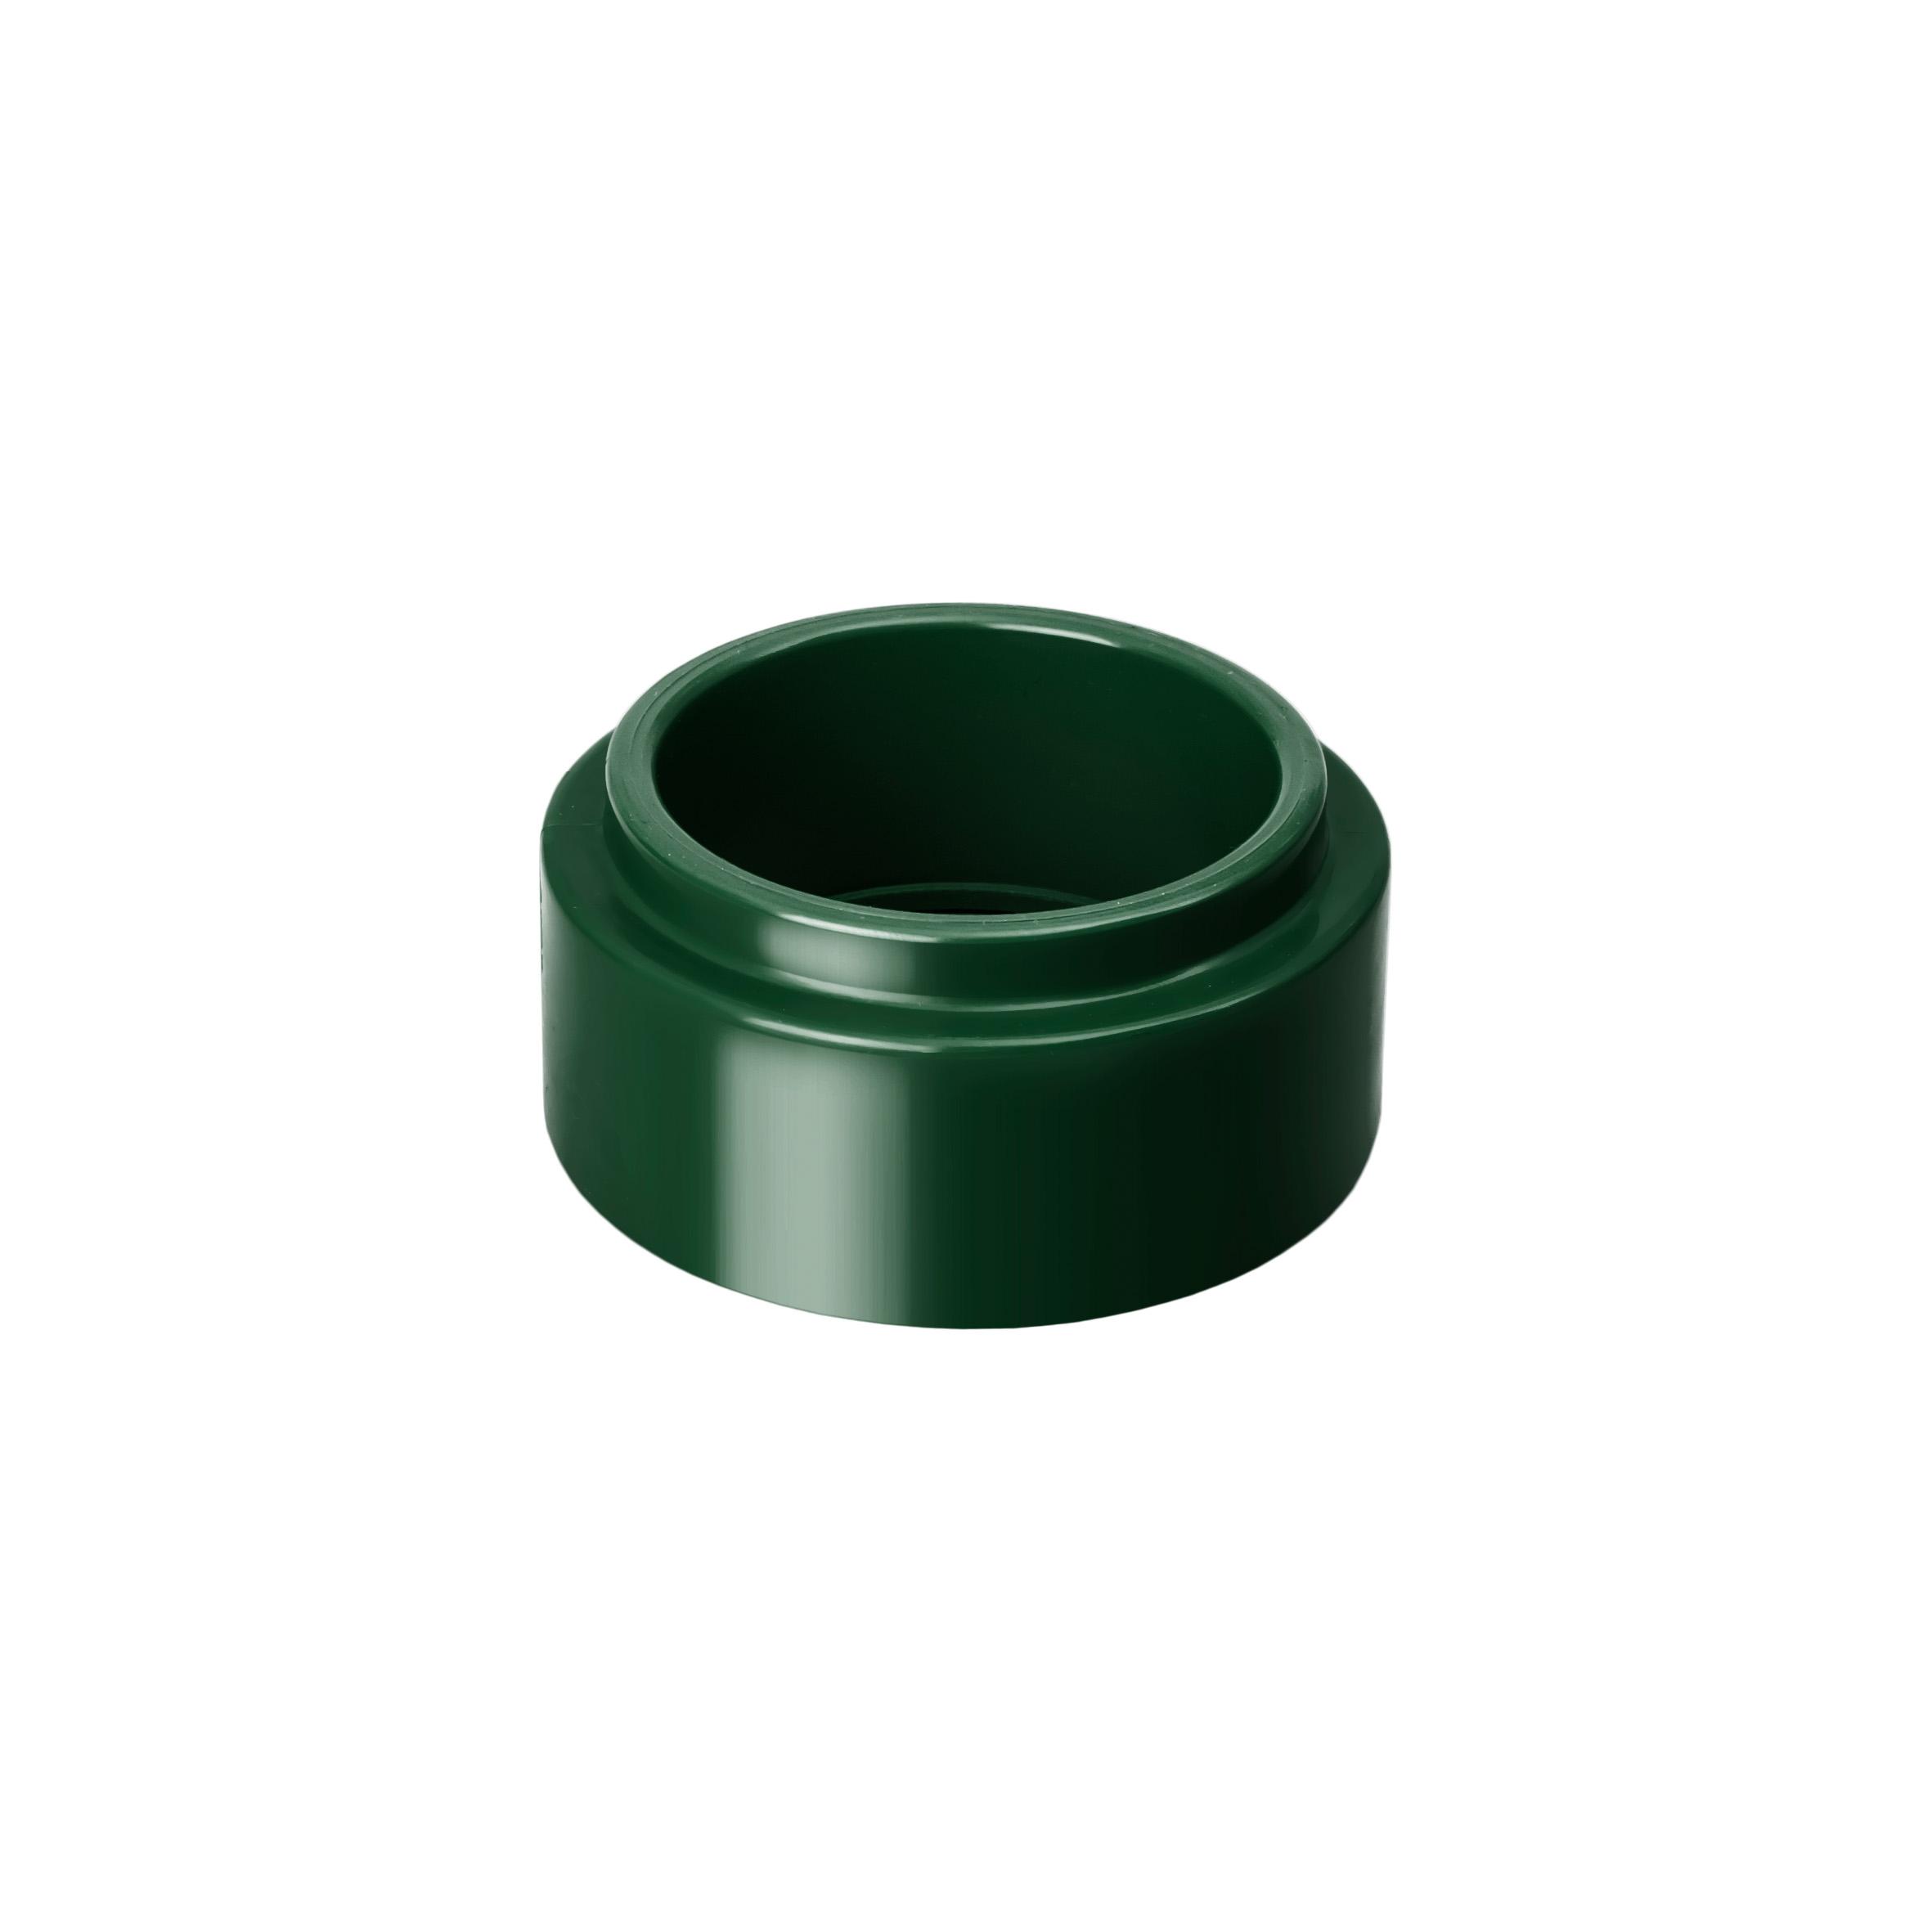 Адаптер труби, зелений 75х100 RainWay